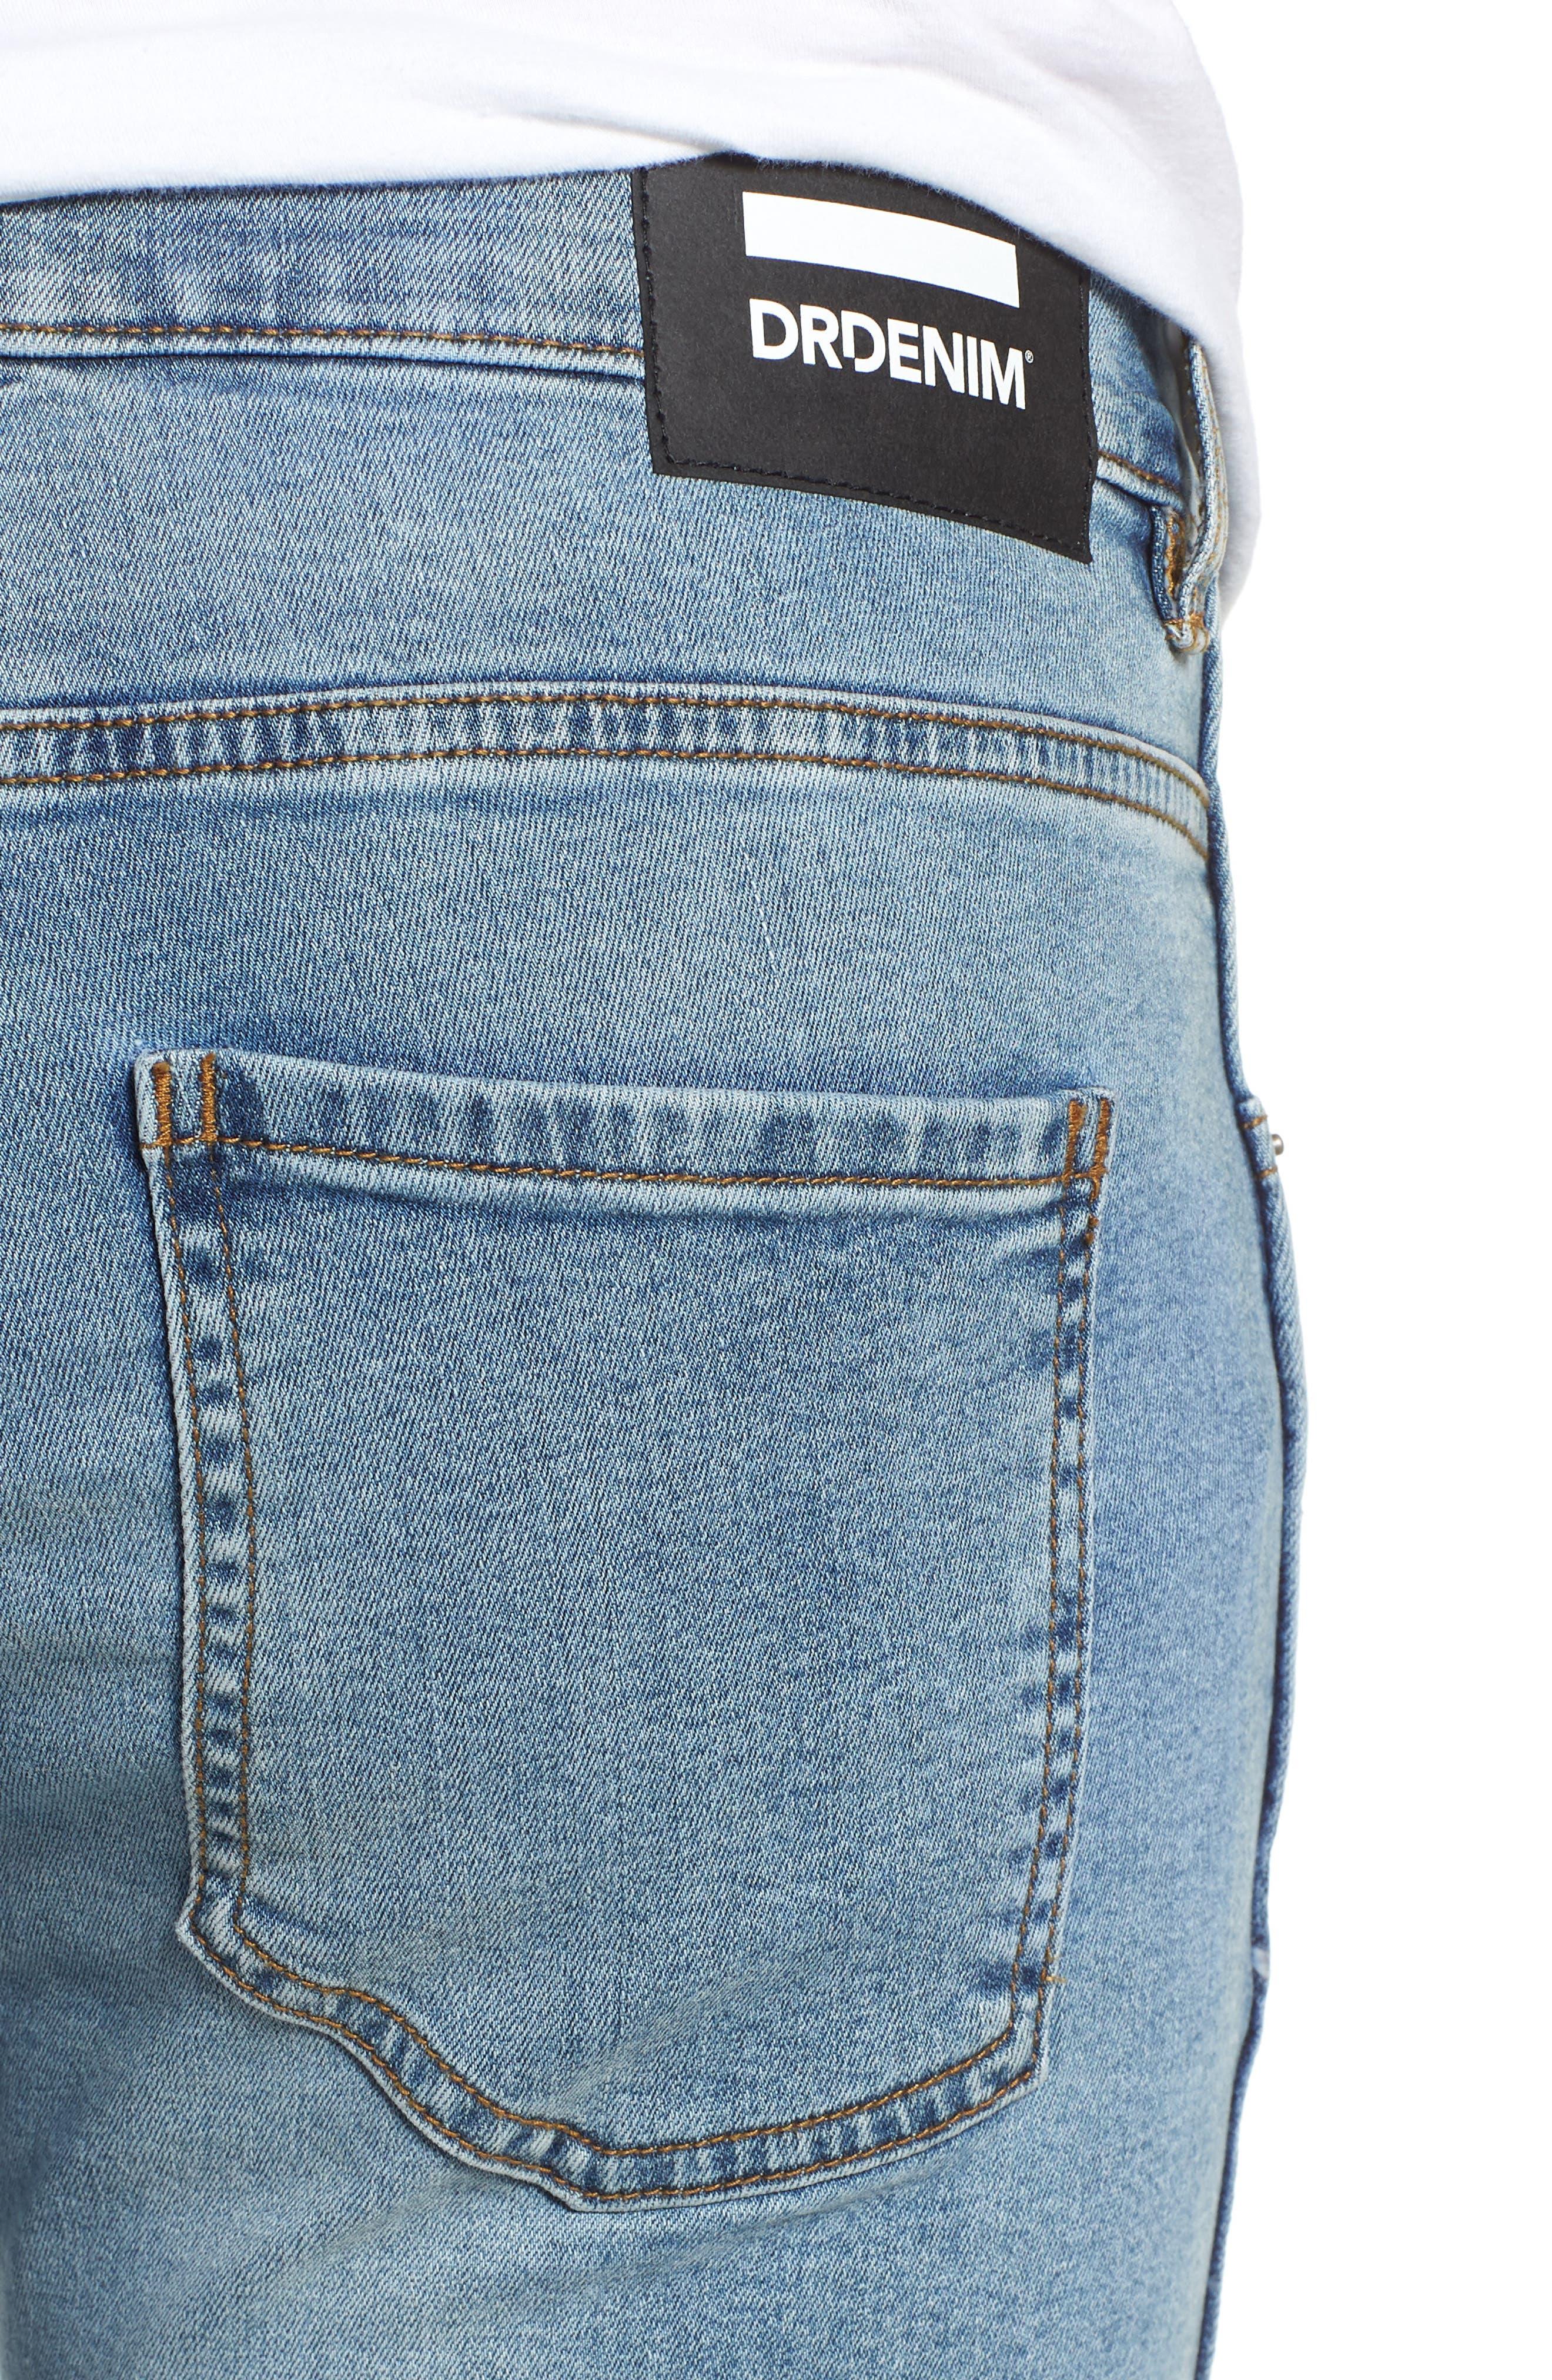 Snap Skinny Fit Jeans,                             Alternate thumbnail 4, color,                             Yonder Blue Wash